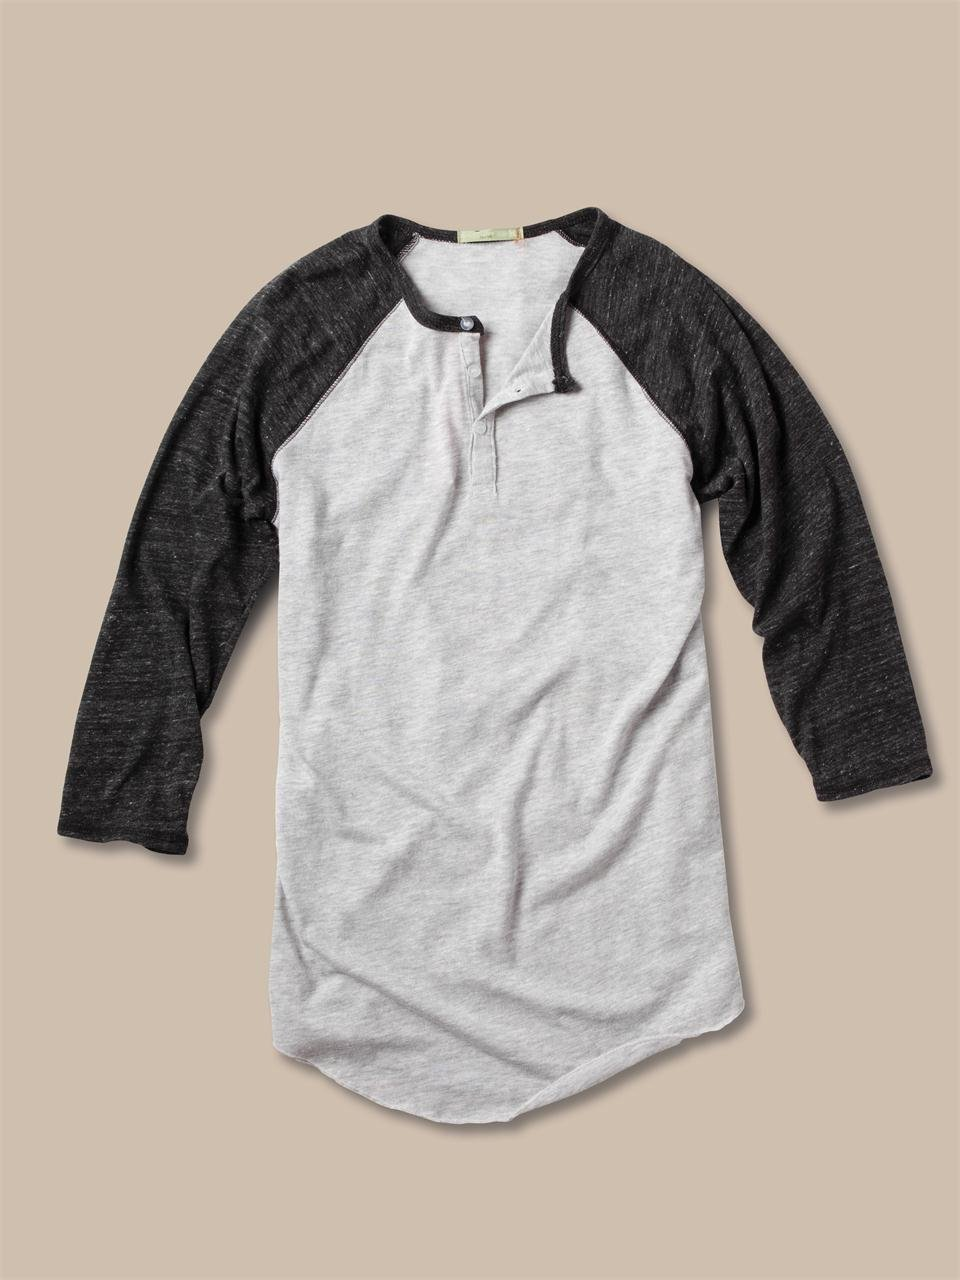 Alternative clothing for women